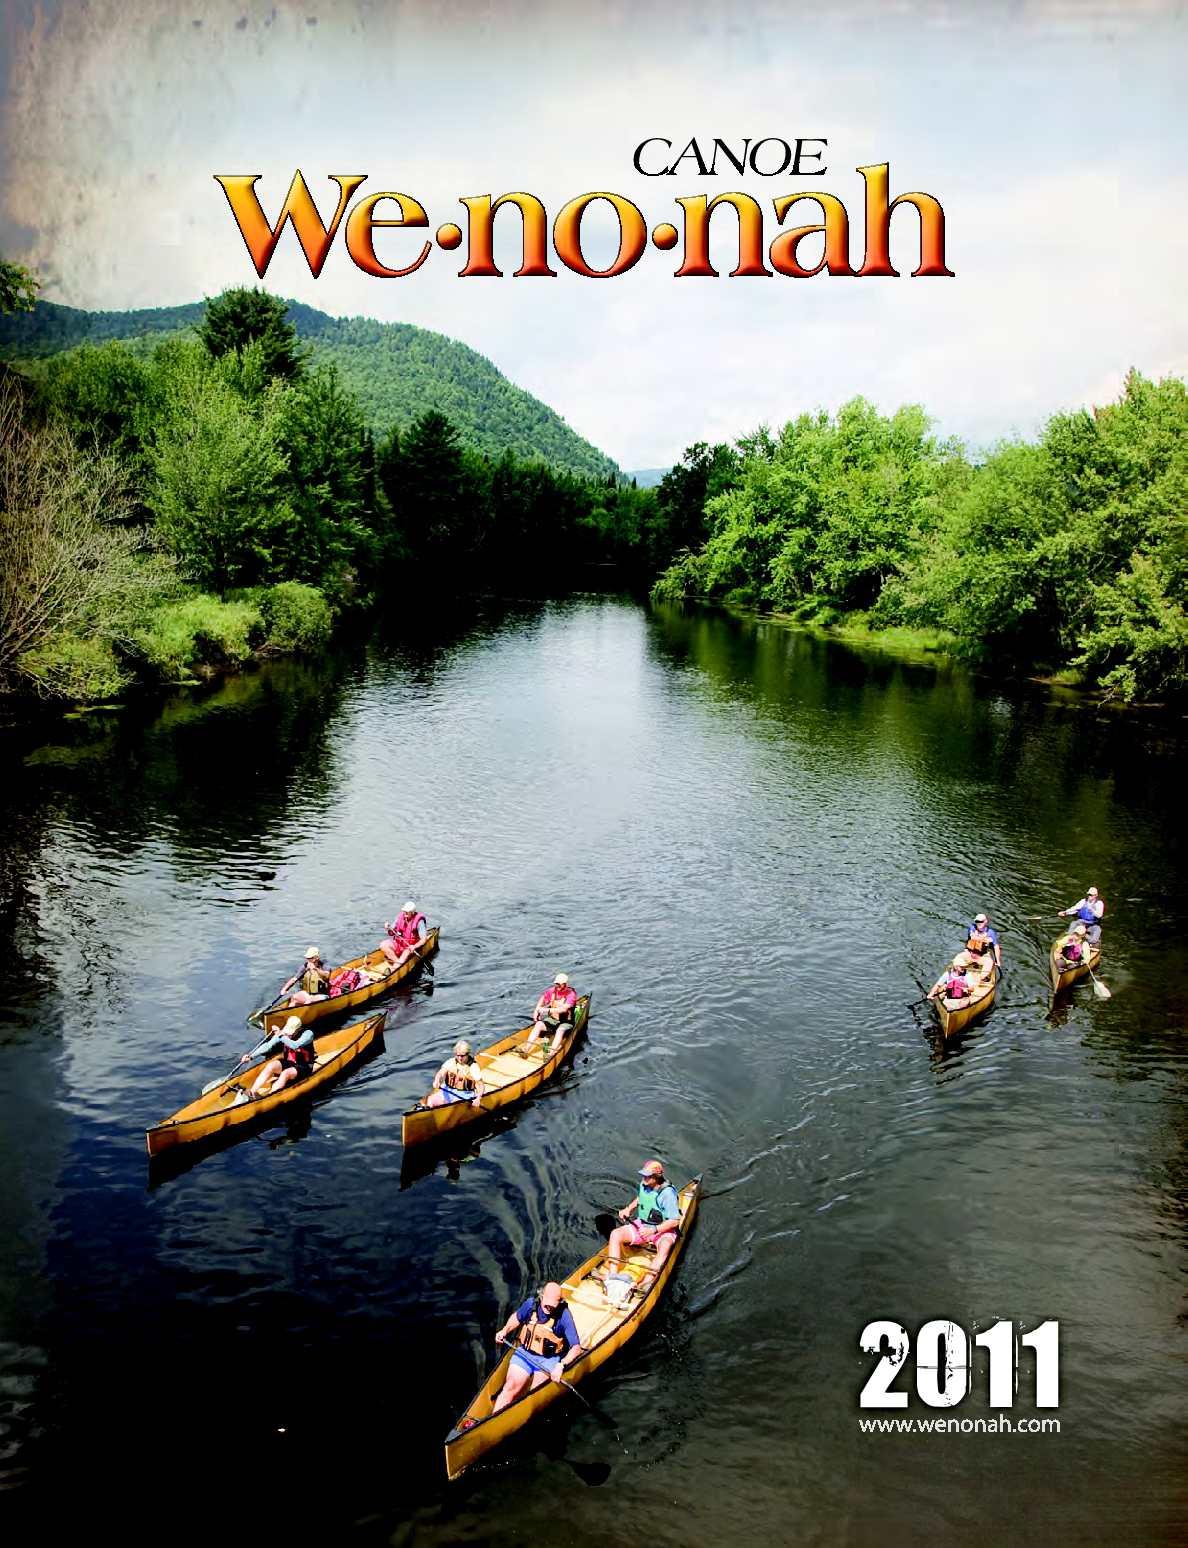 Calaméo - 2011 Wenonah Canoe Catalog